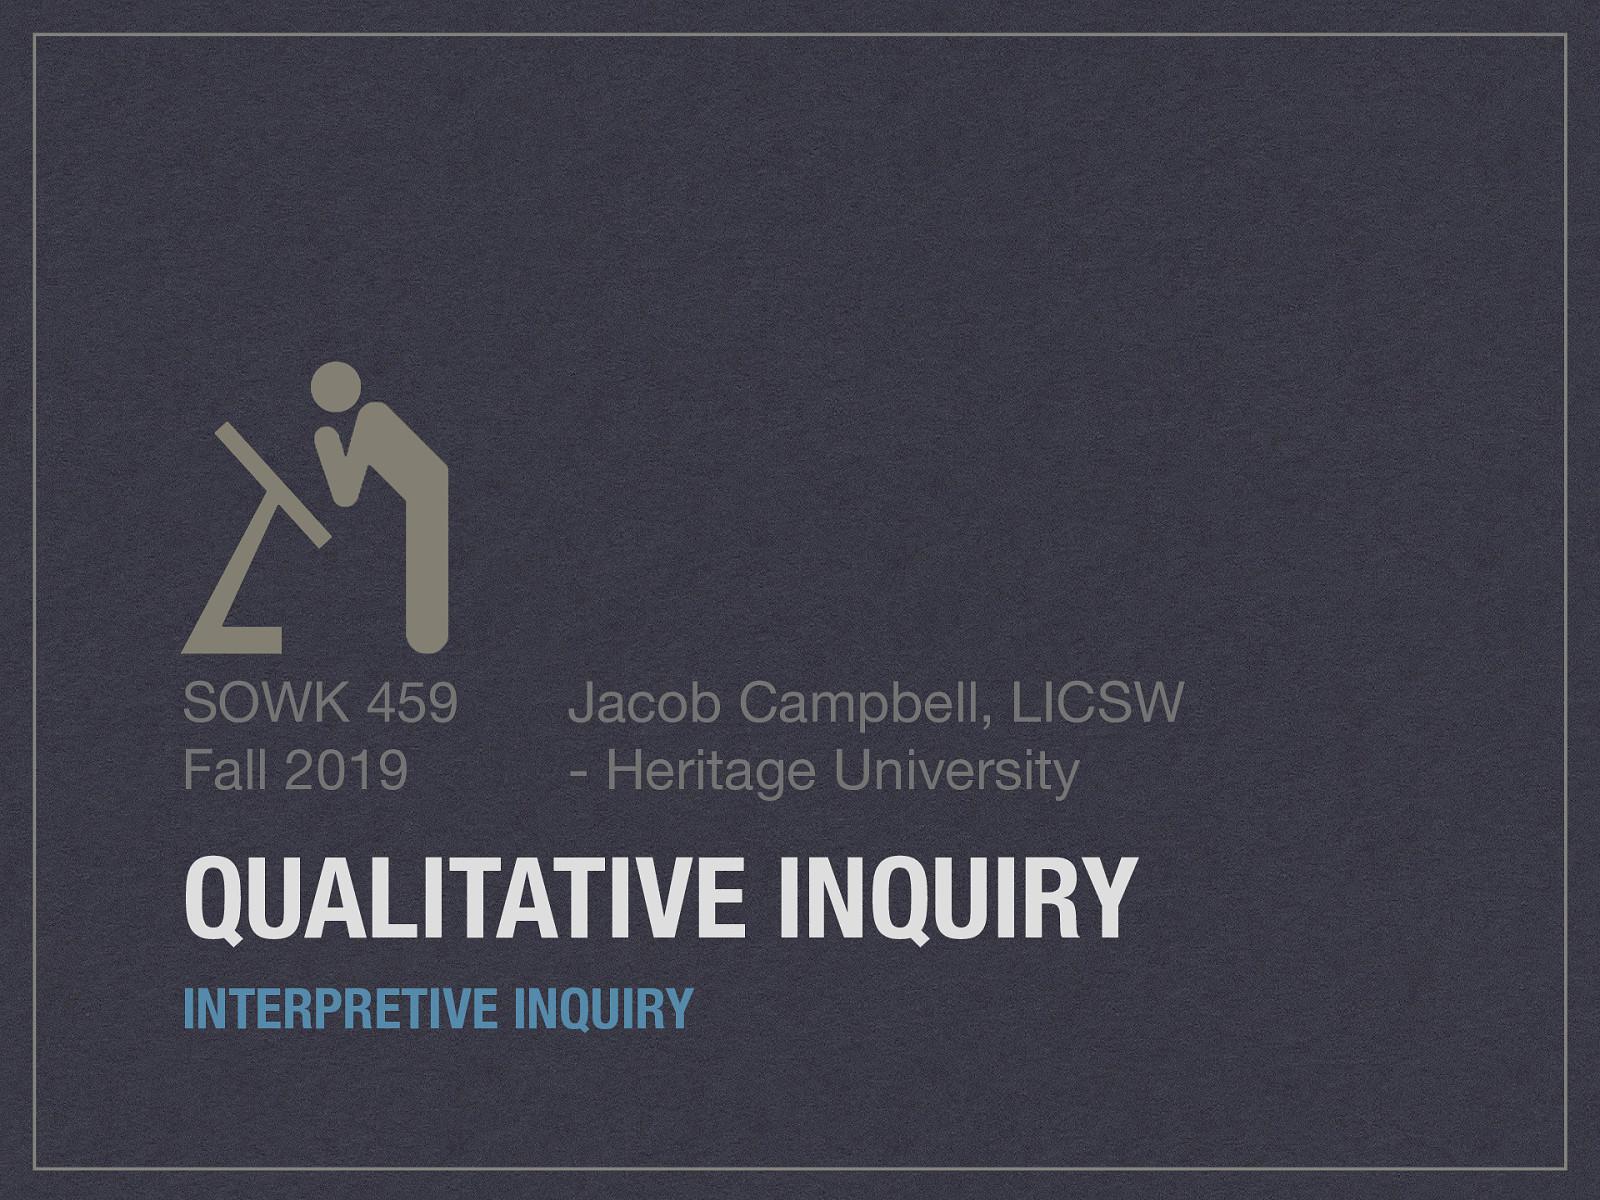 Week 14 - Qualitative Inquiry